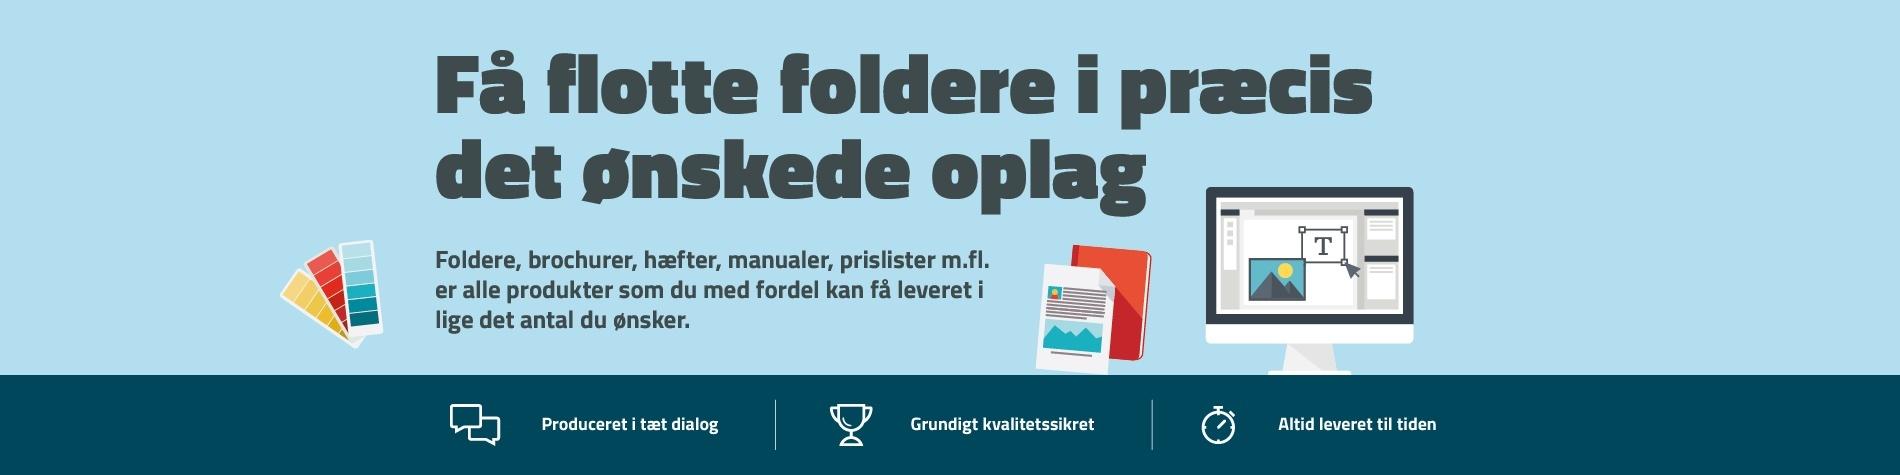 Foldere